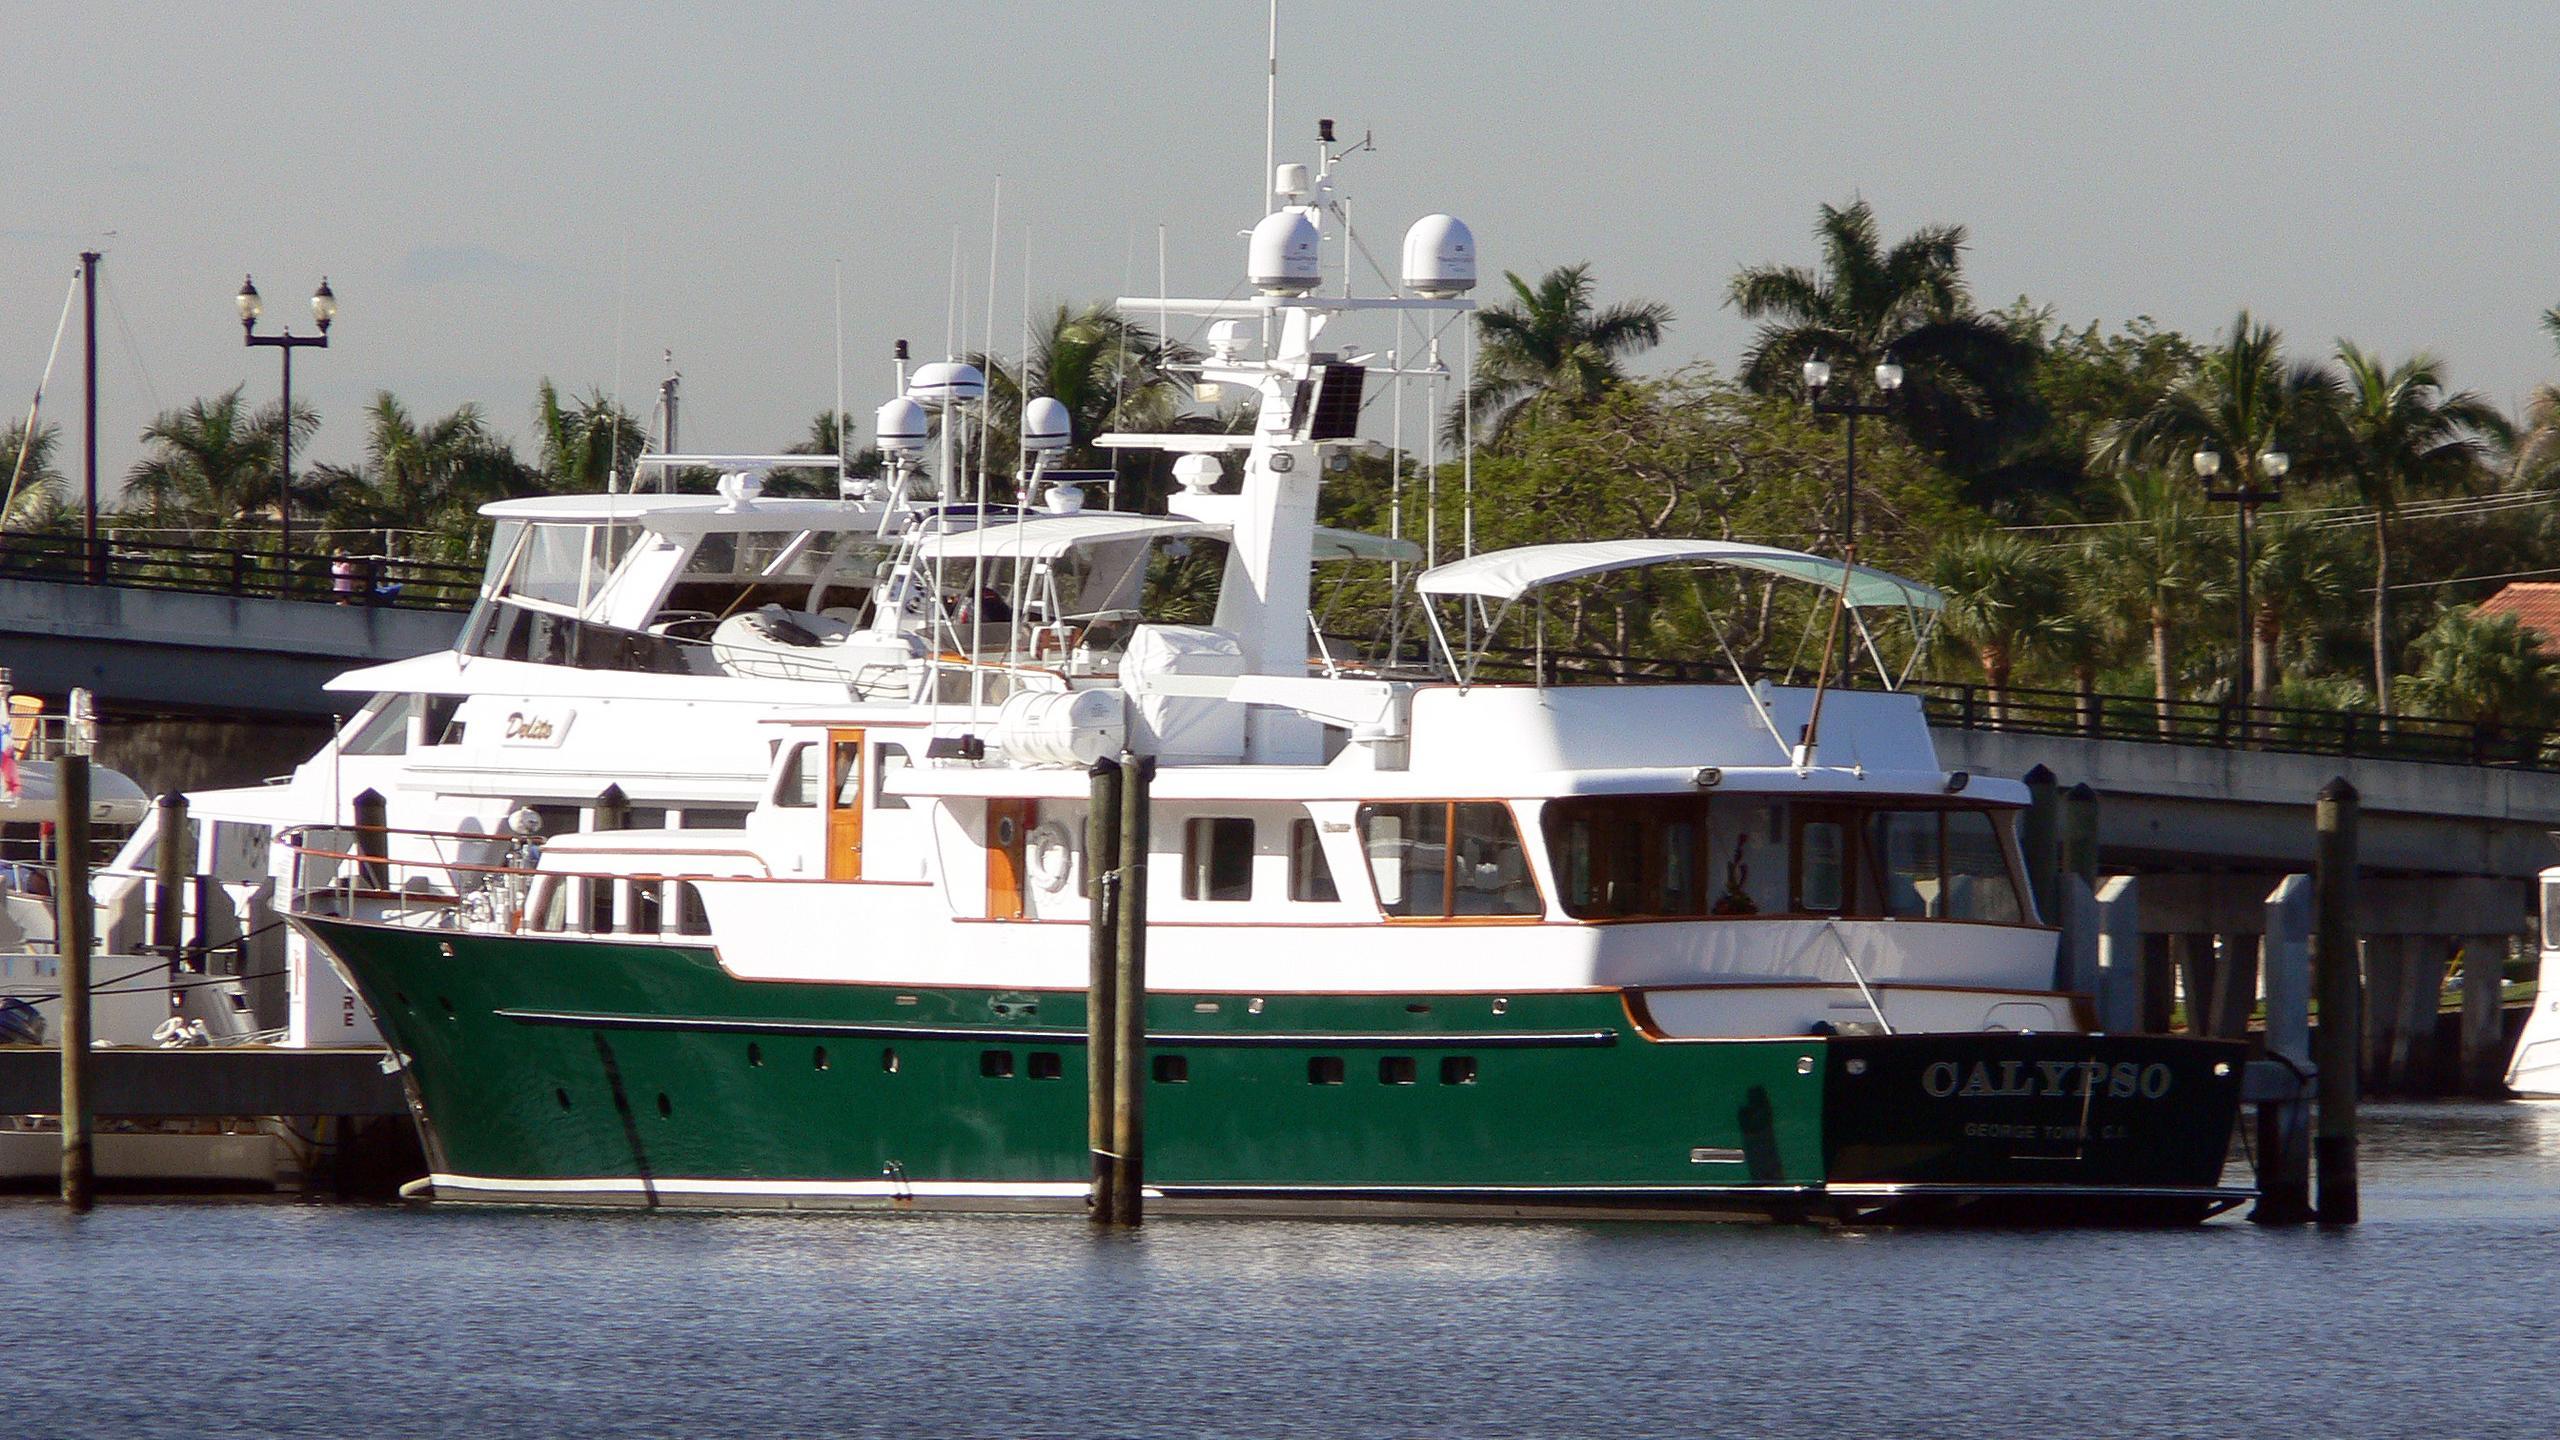 calypso-motor-yacht-feadship-1971-31m-half-profile